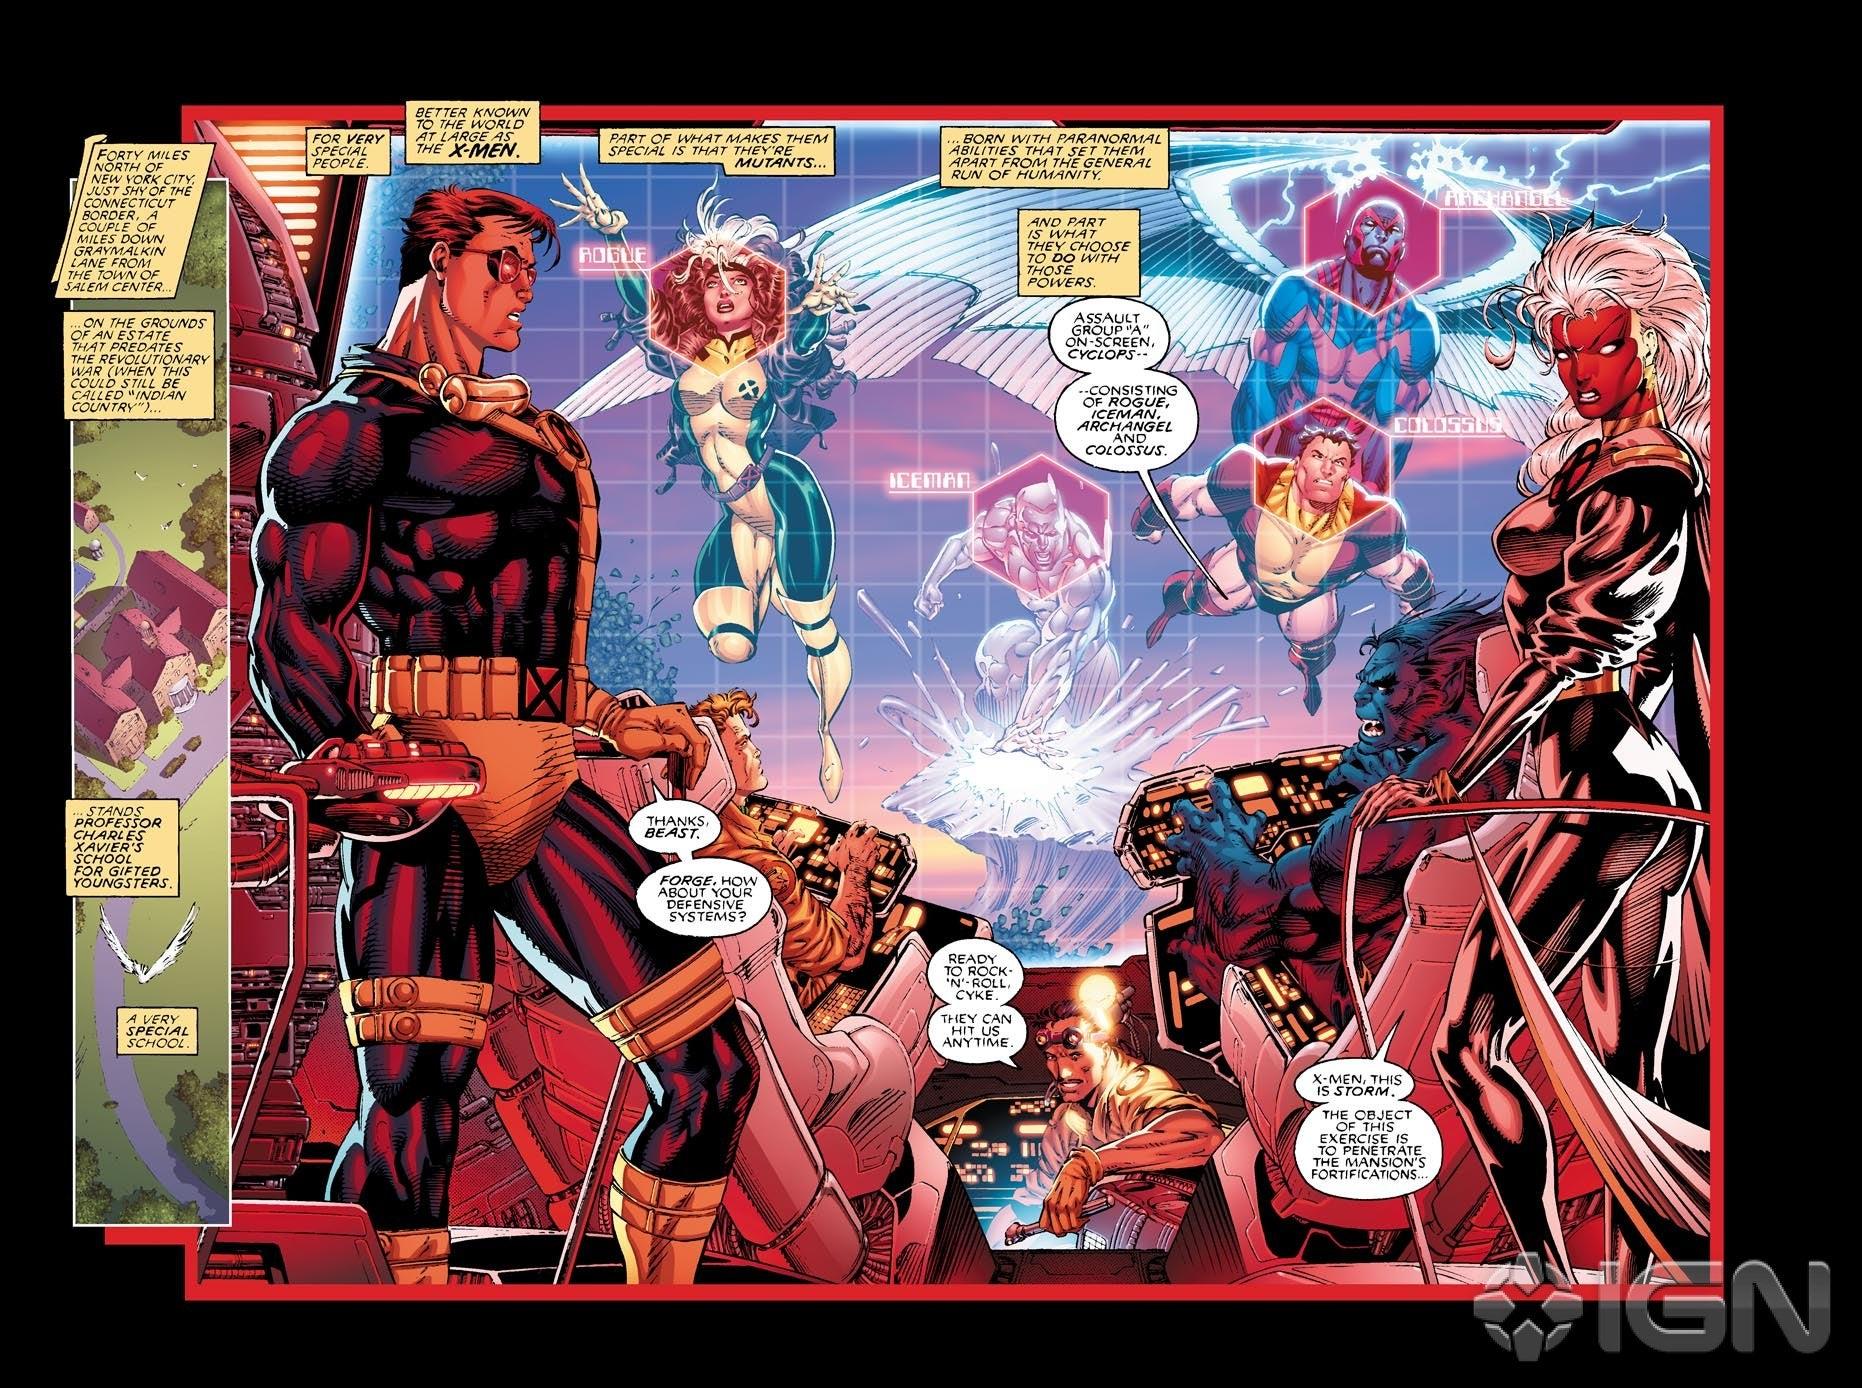 Imagen de X-Men #1 Vol. 2 Interior coresía de IGN